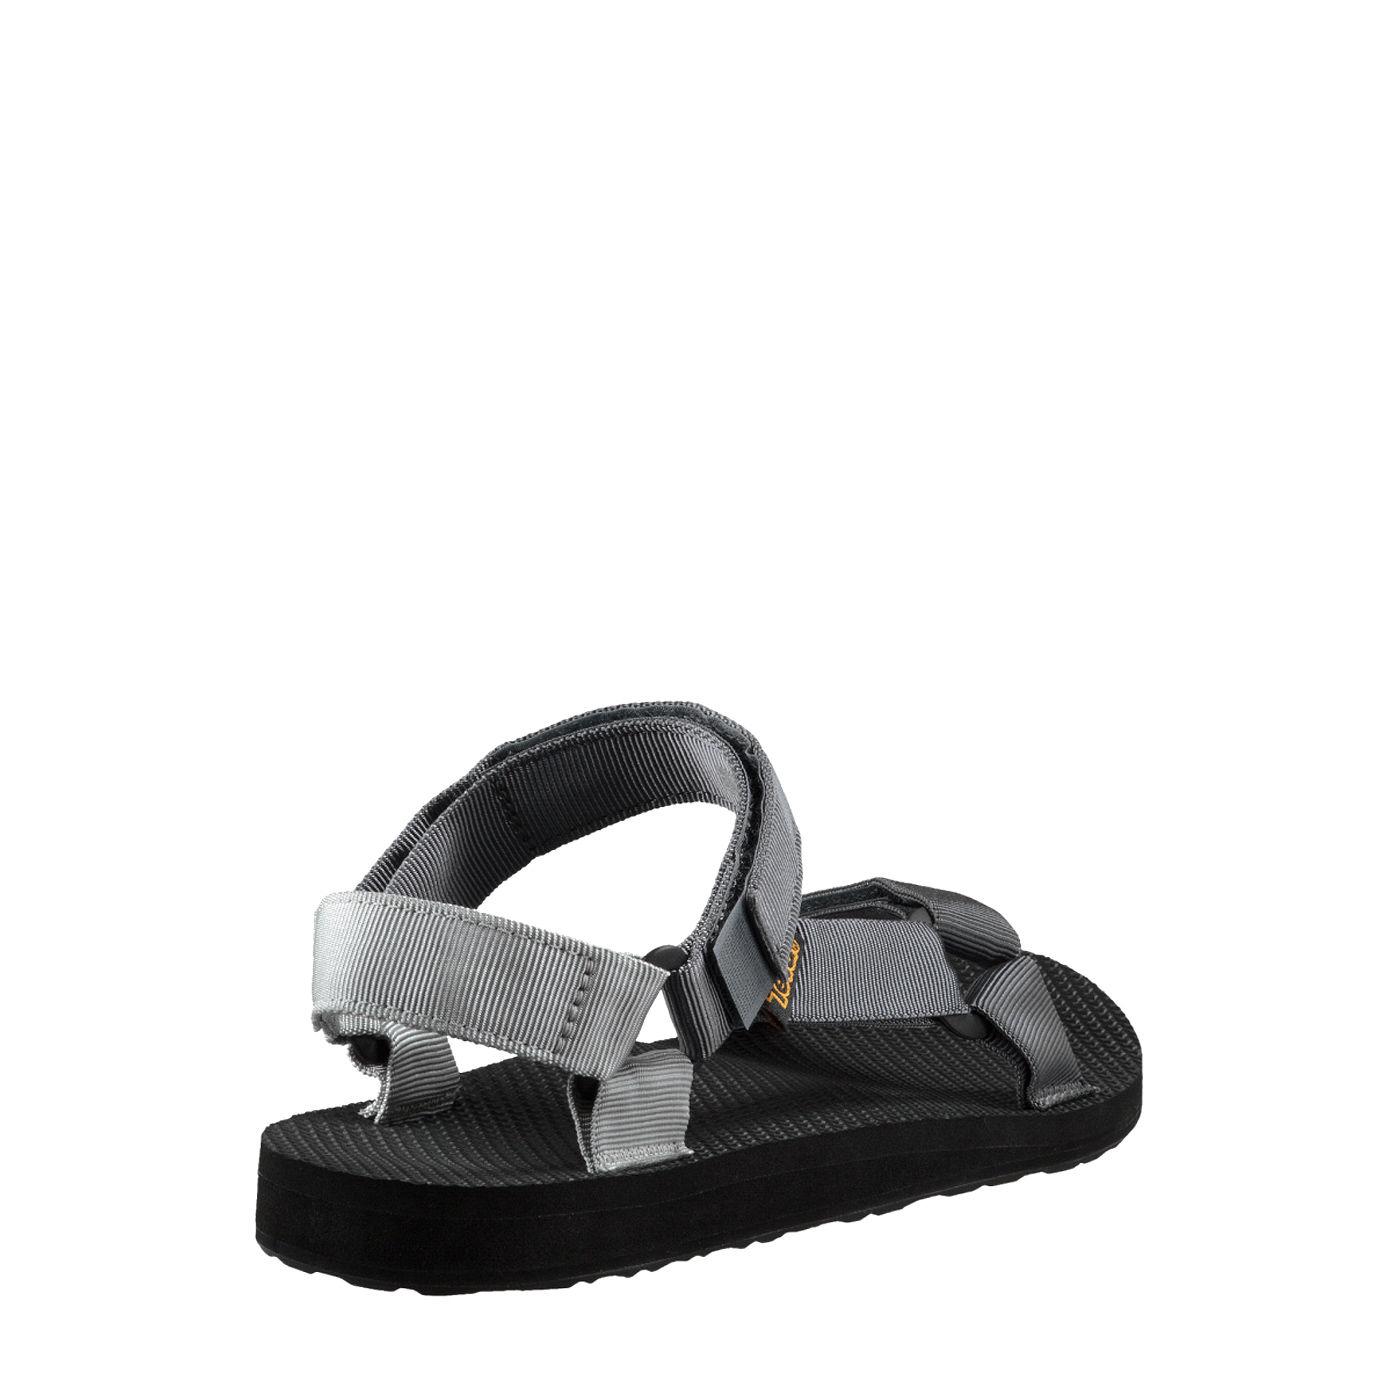 Teva® Original Universal for Men | The First Sport Sandal at Teva.com